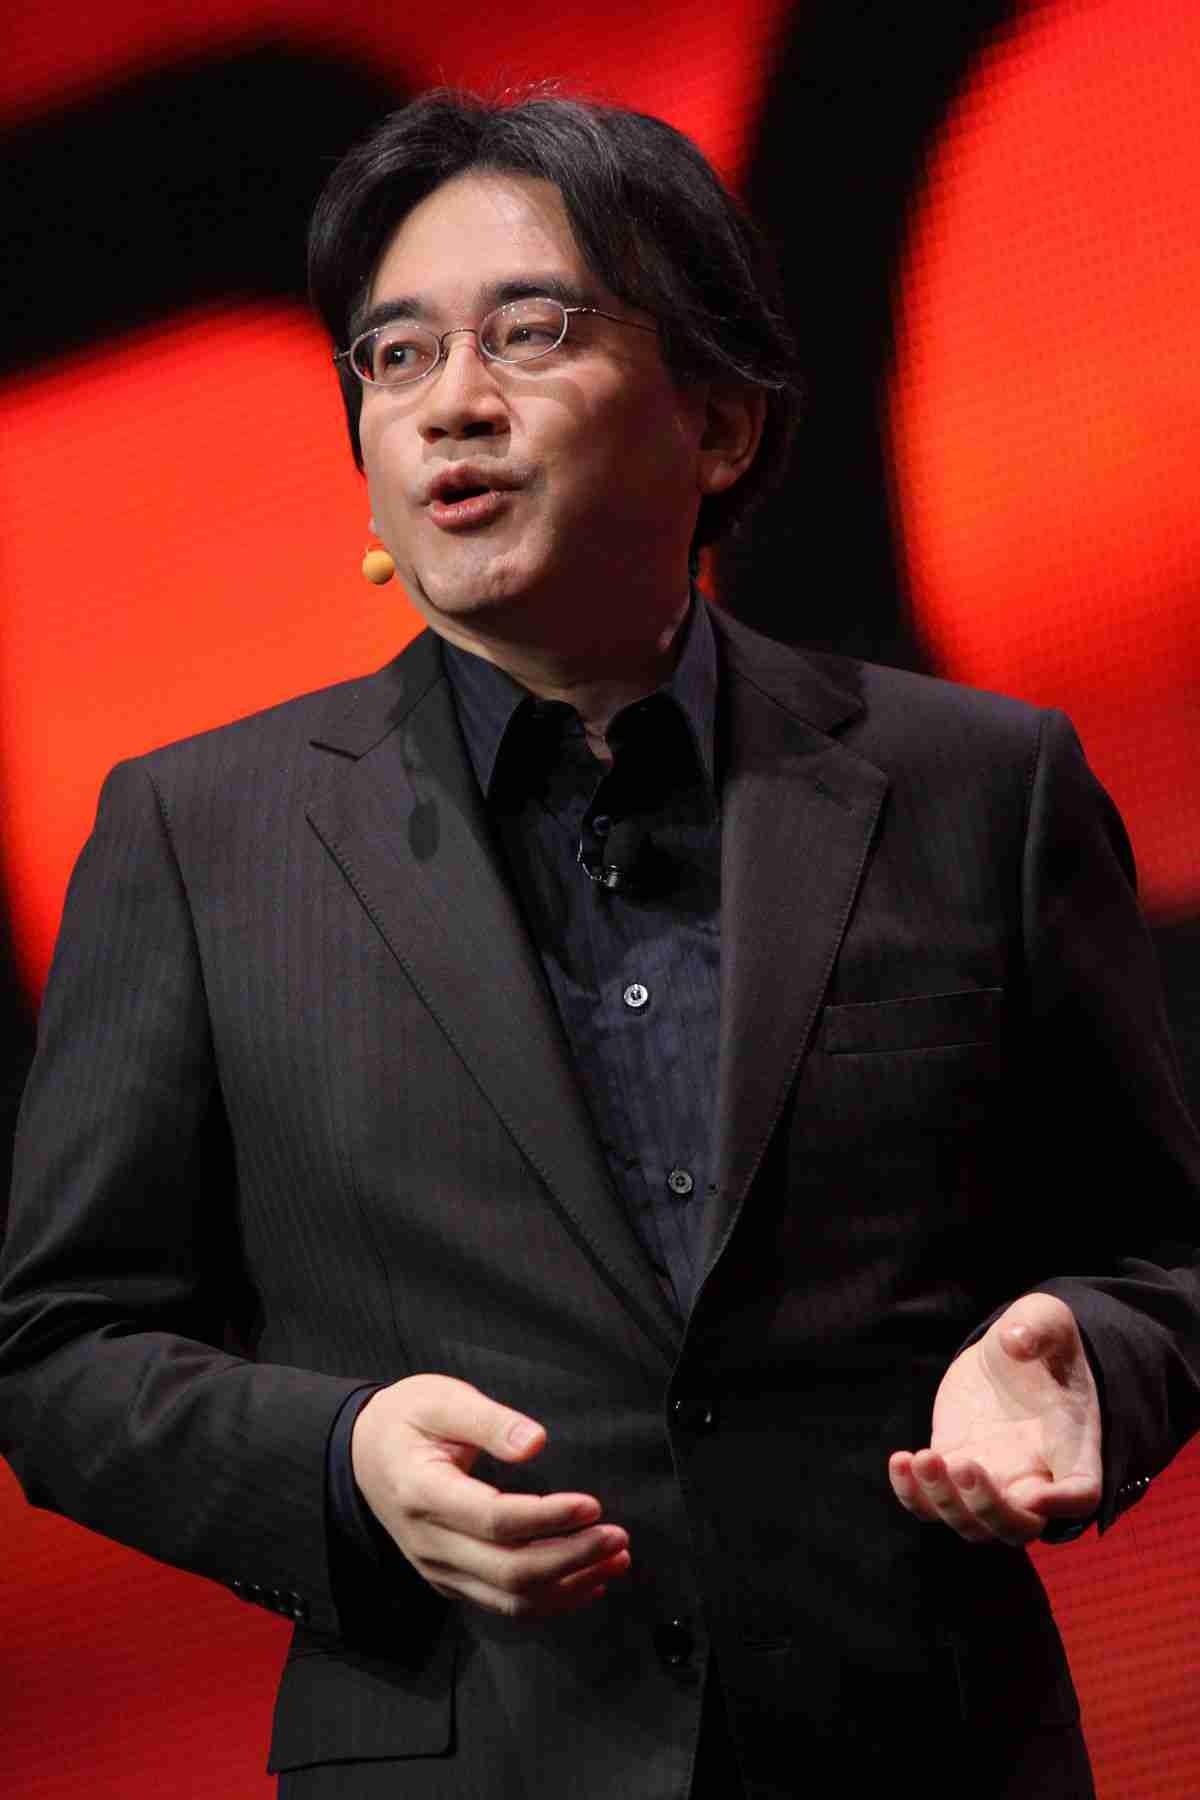 岩田聡 - Wikipedia